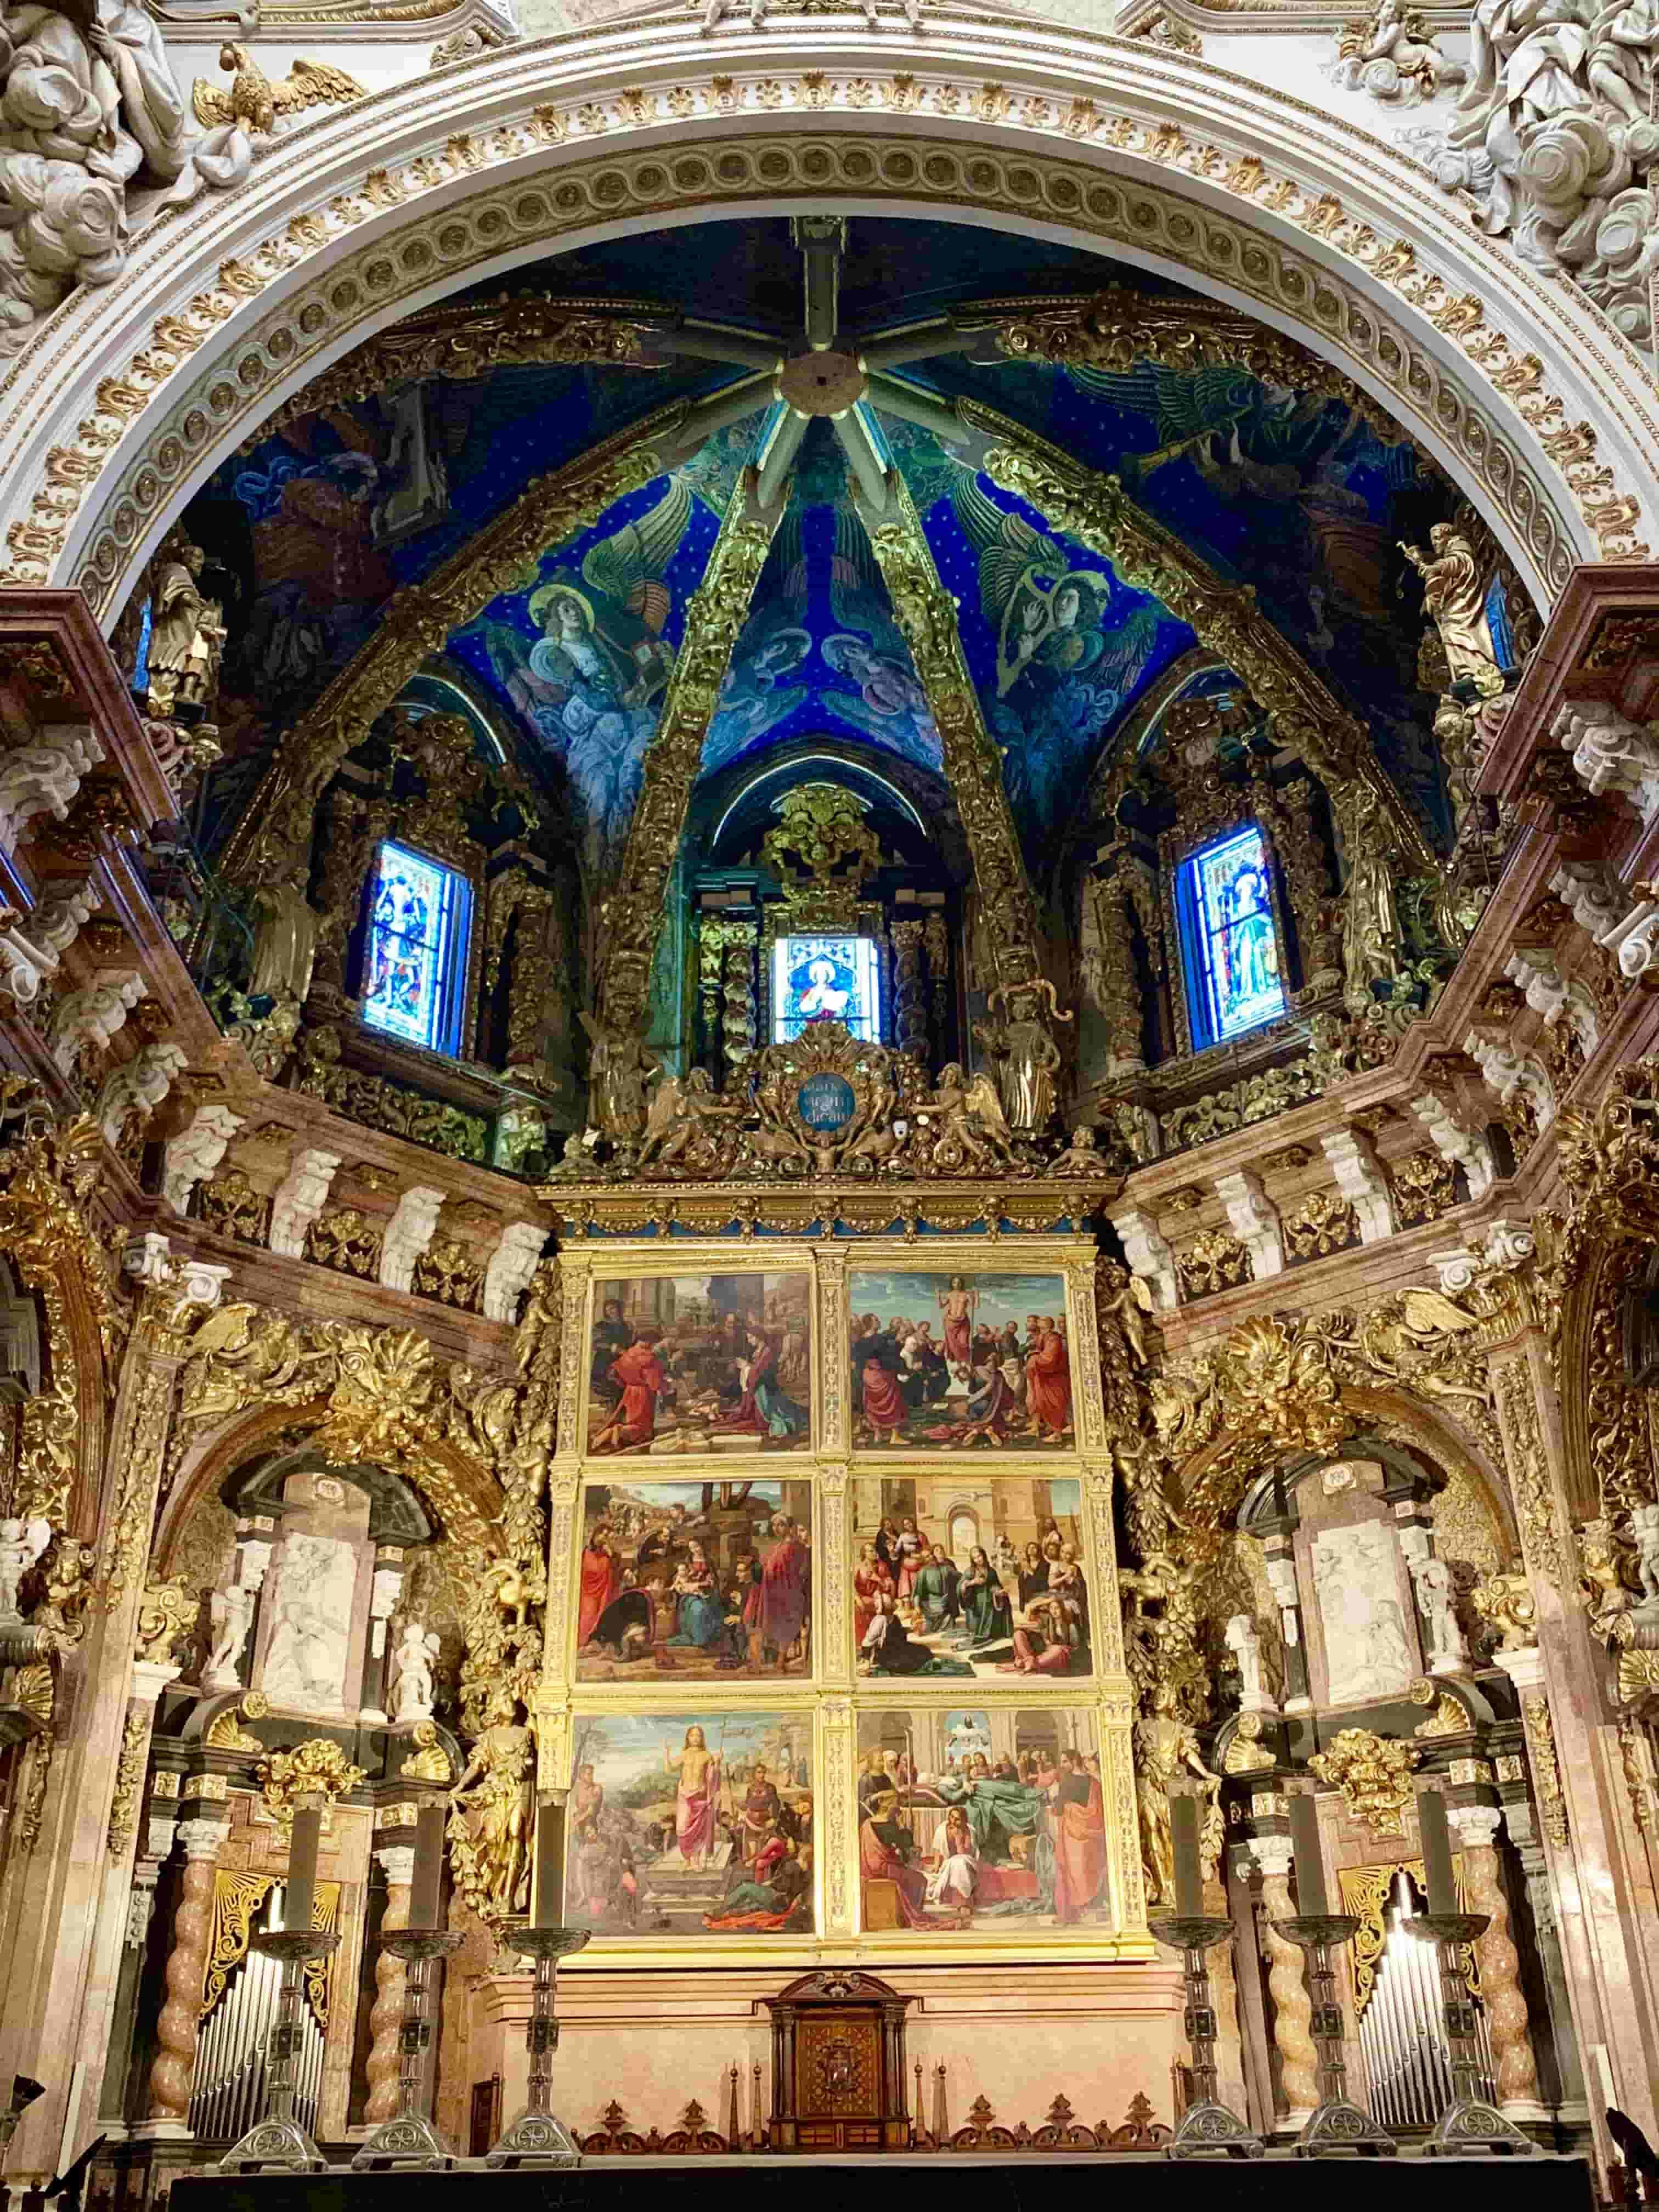 Visita la Catedral de Valencia, descubre su historia con Visit Tour.